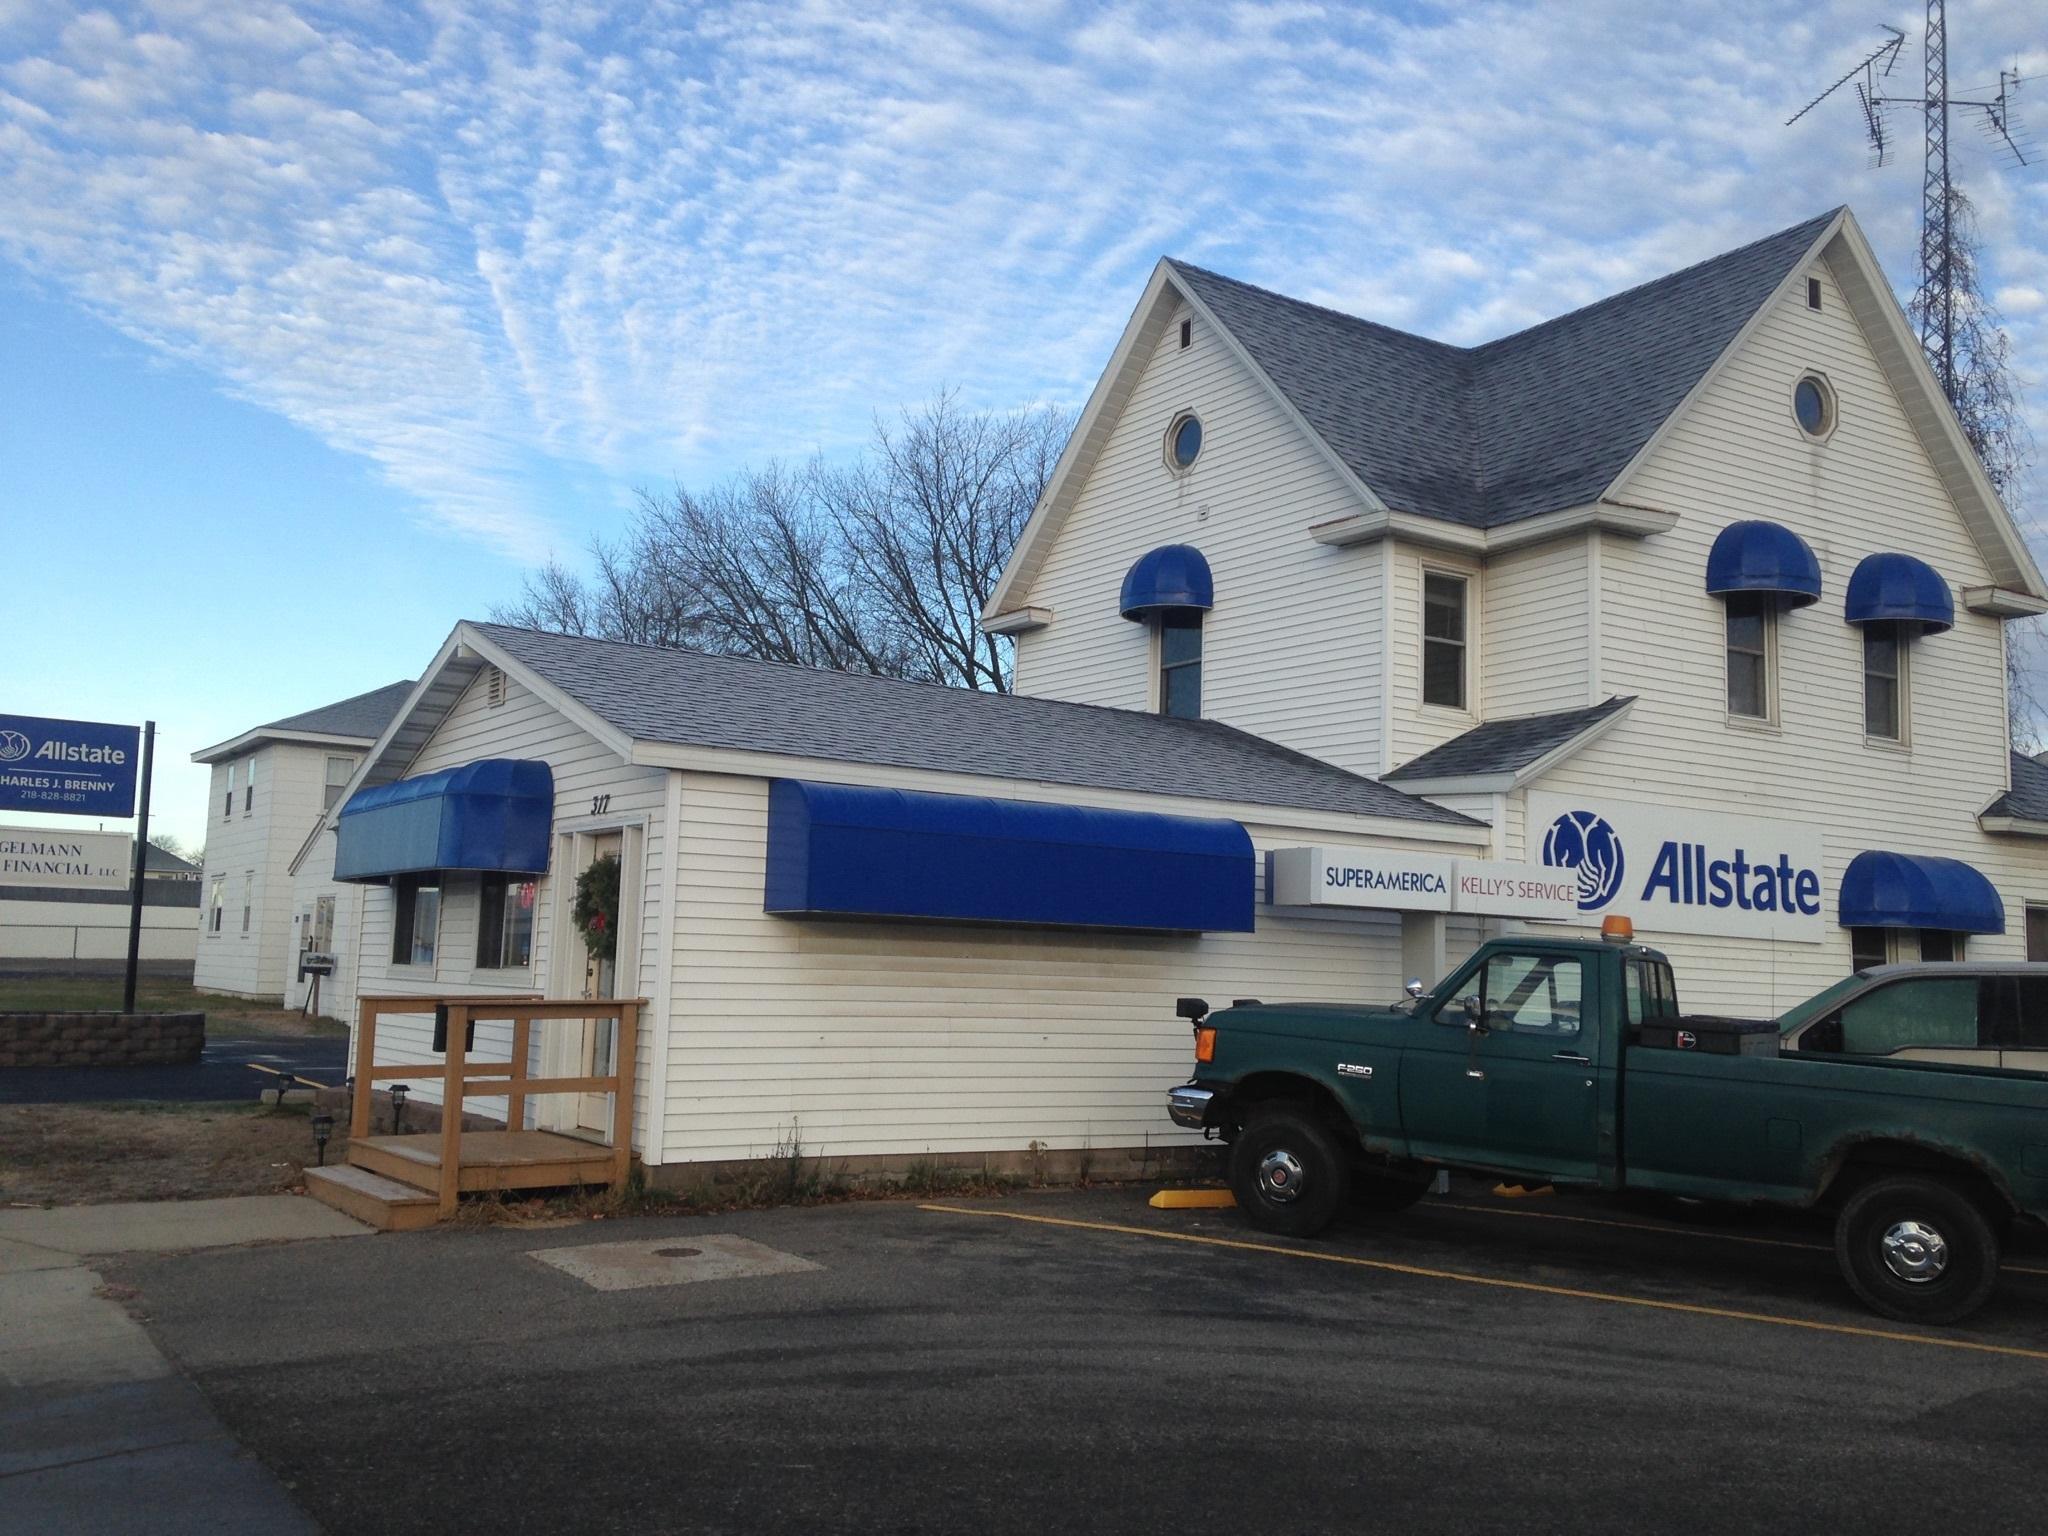 Charles Brenny: Allstate Insurance image 0